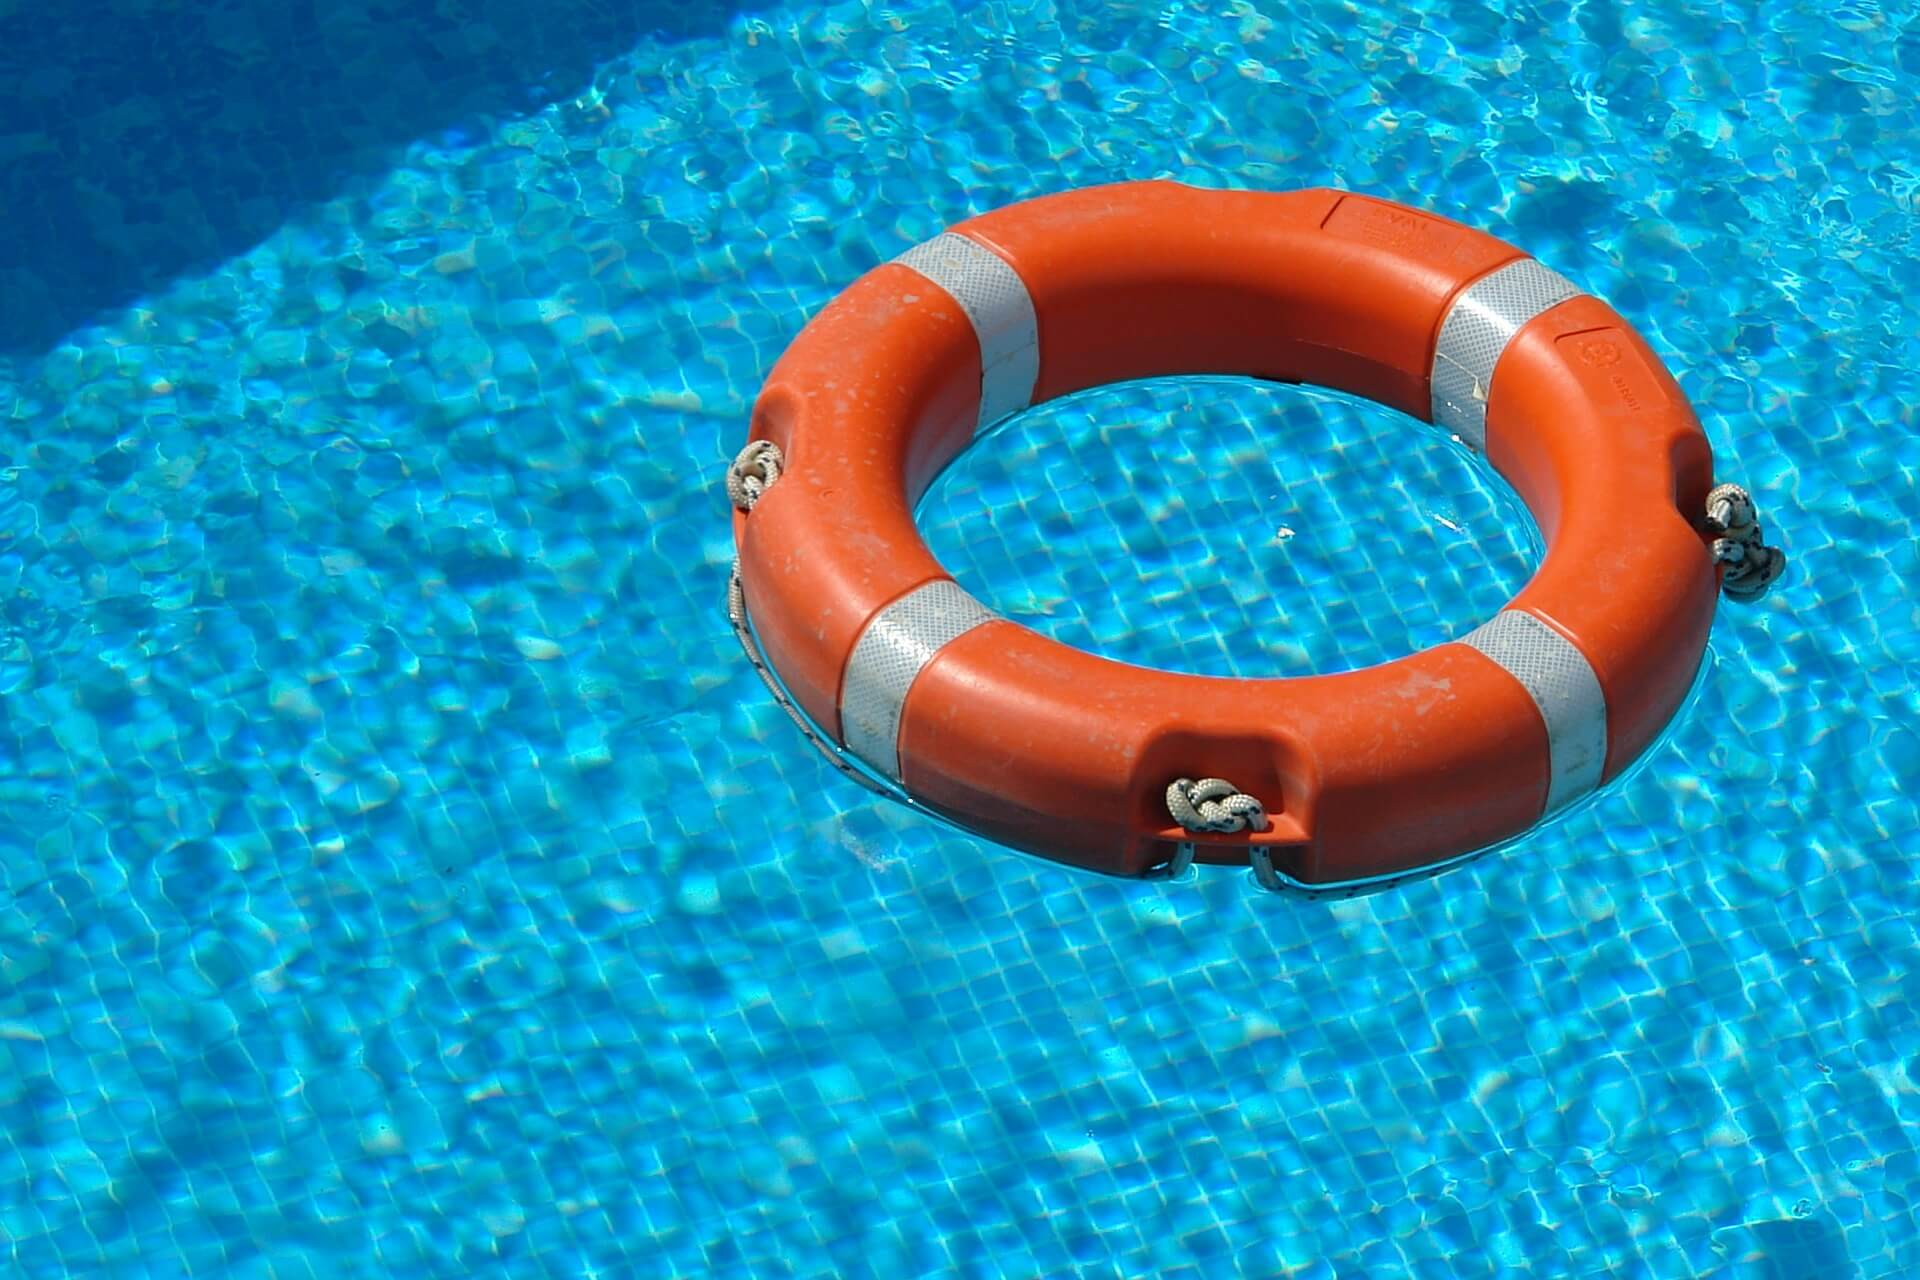 life preserver floating in pool